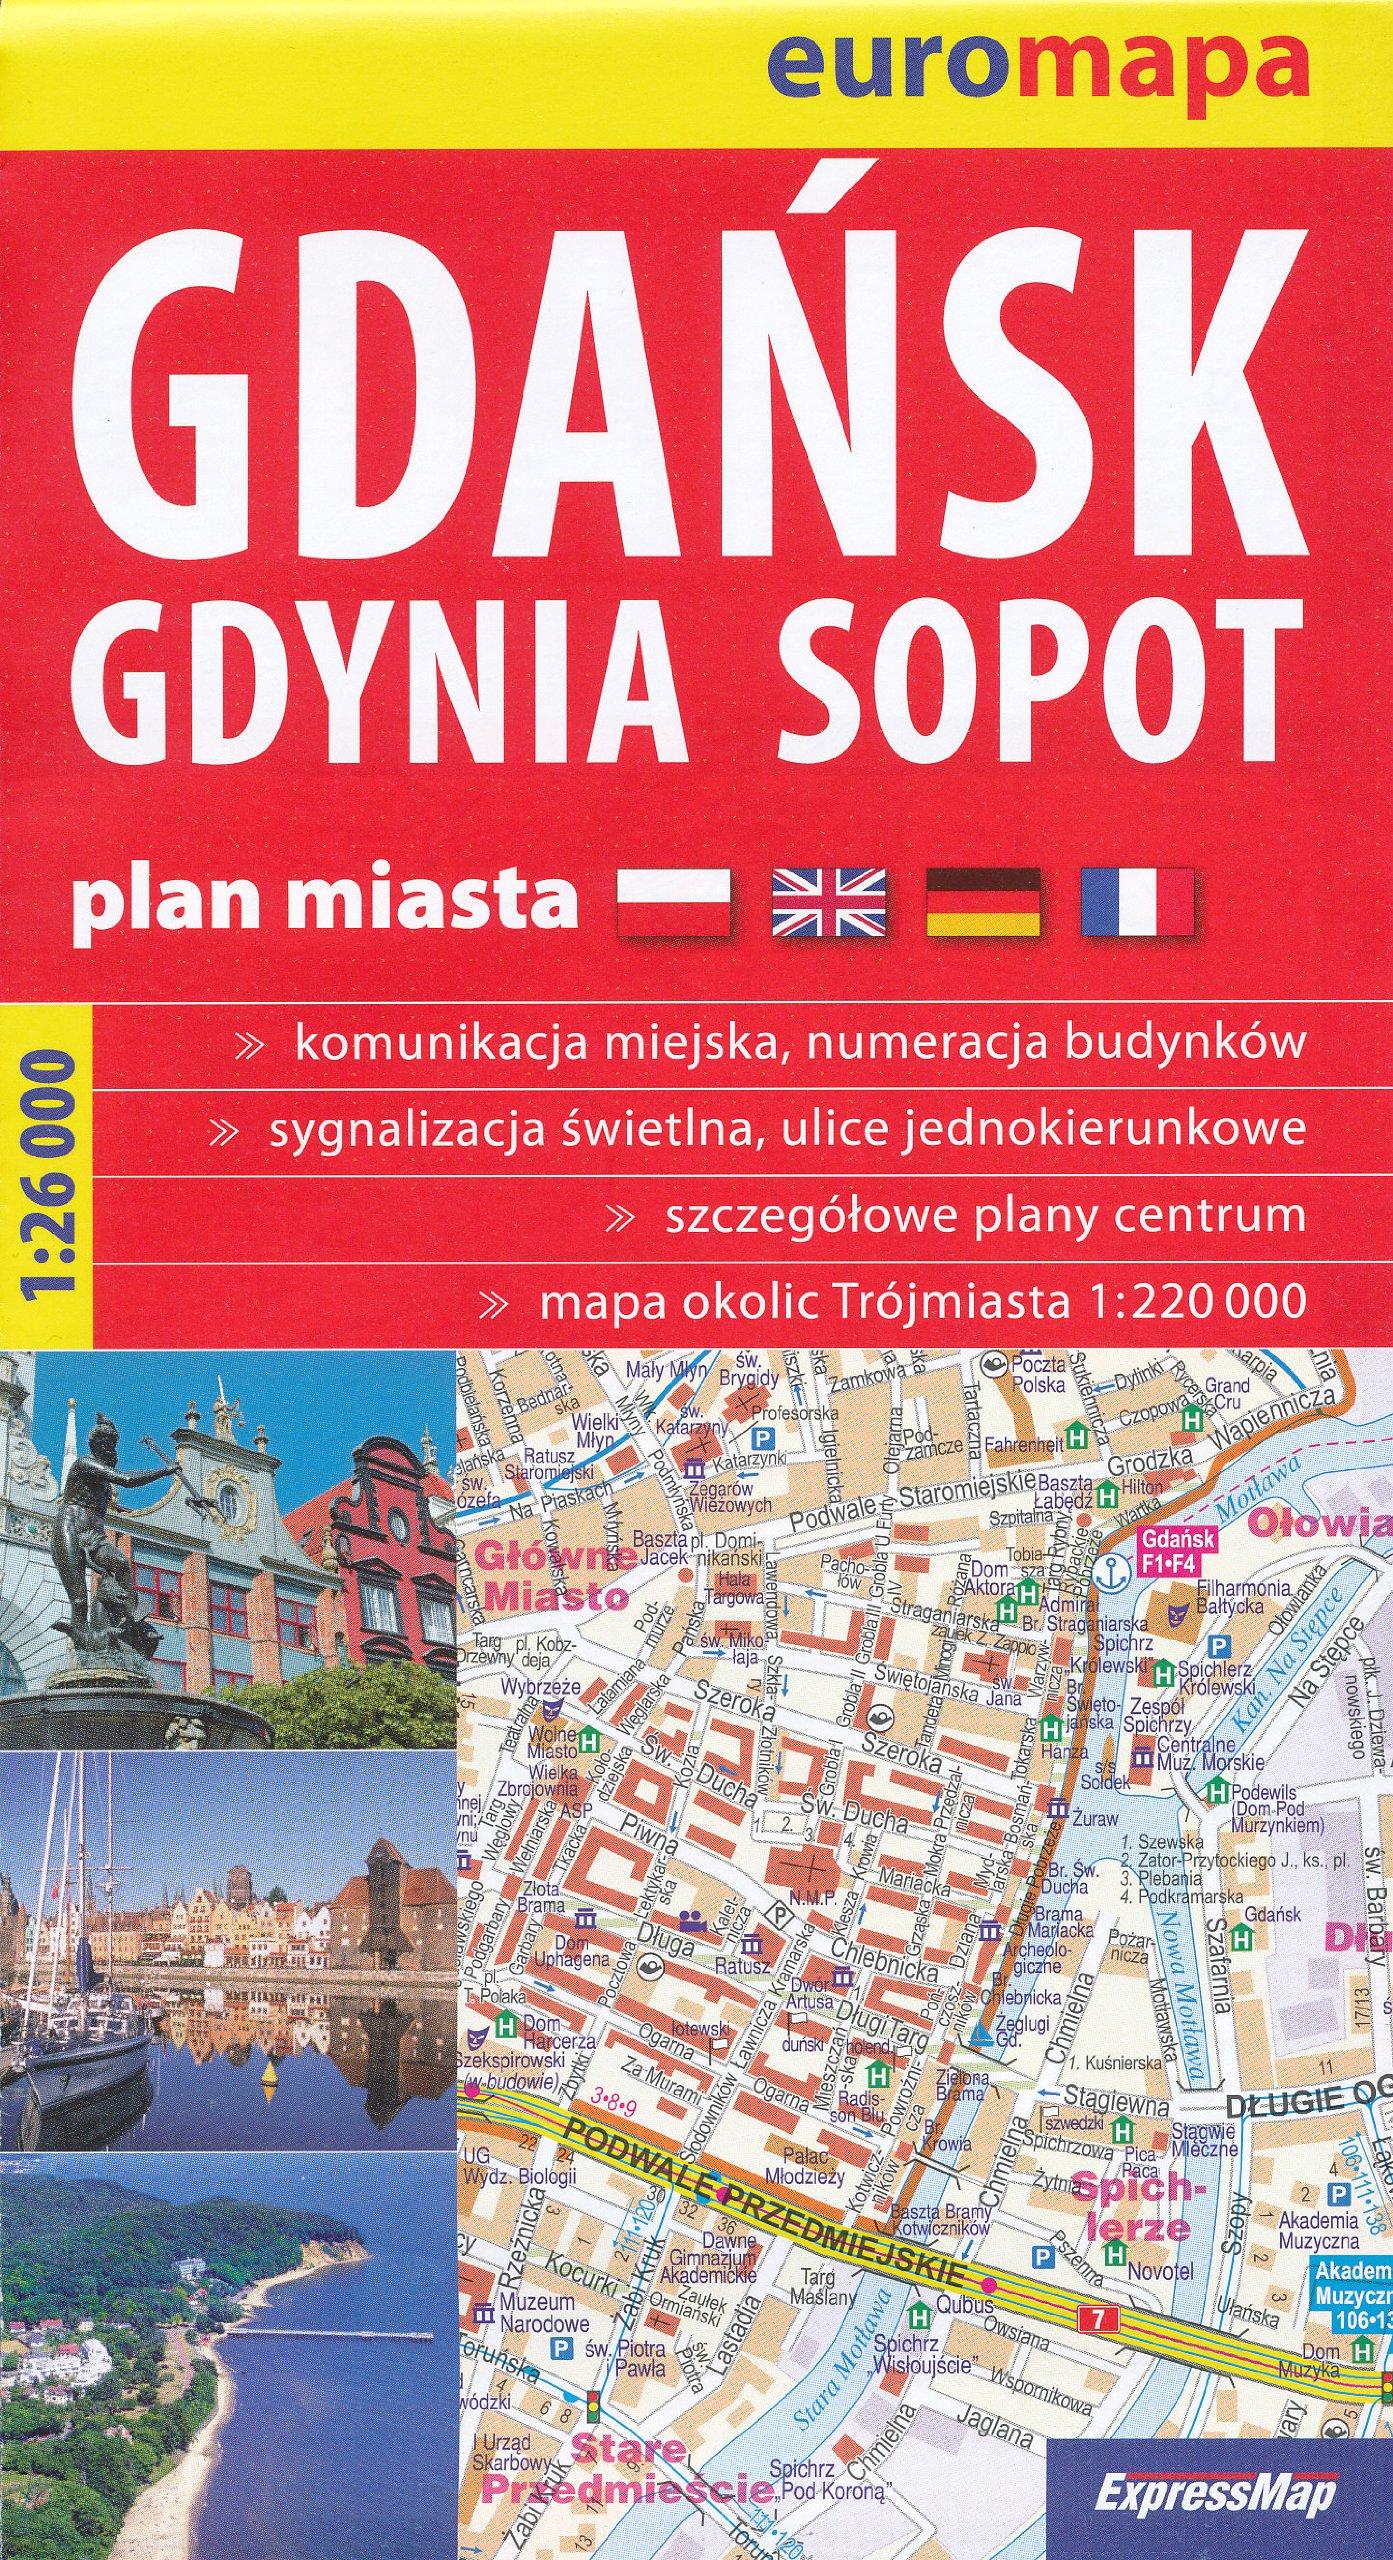 Gdansk Gdynia Sopot Poland 126 000 Large Street Map